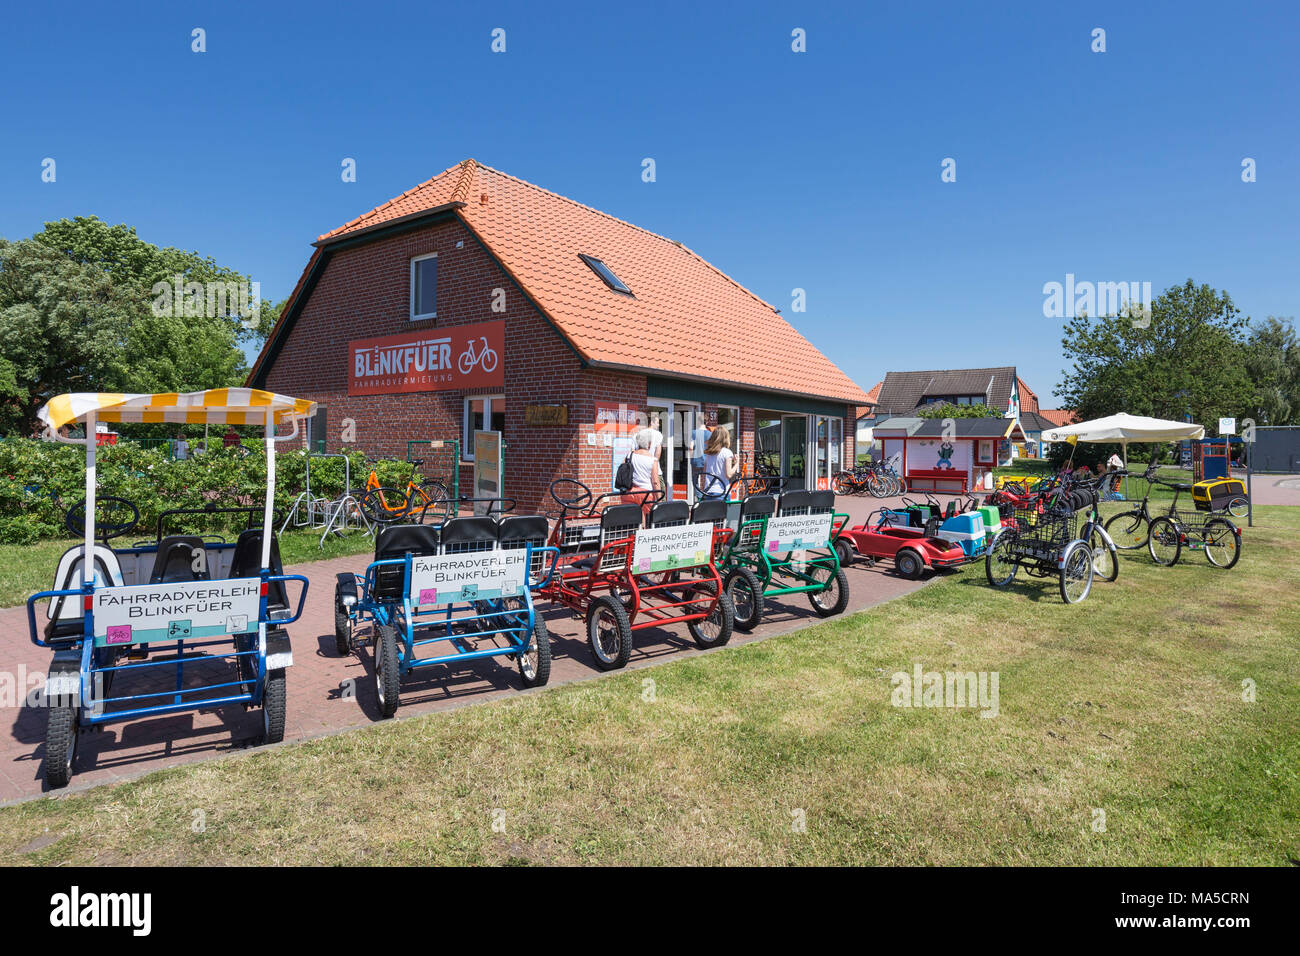 Bike rental Blinkfüer, Buddy Bike, Burhave, Butjadingen, municipality in the administrative district of Wesermarsch, - Stock Image